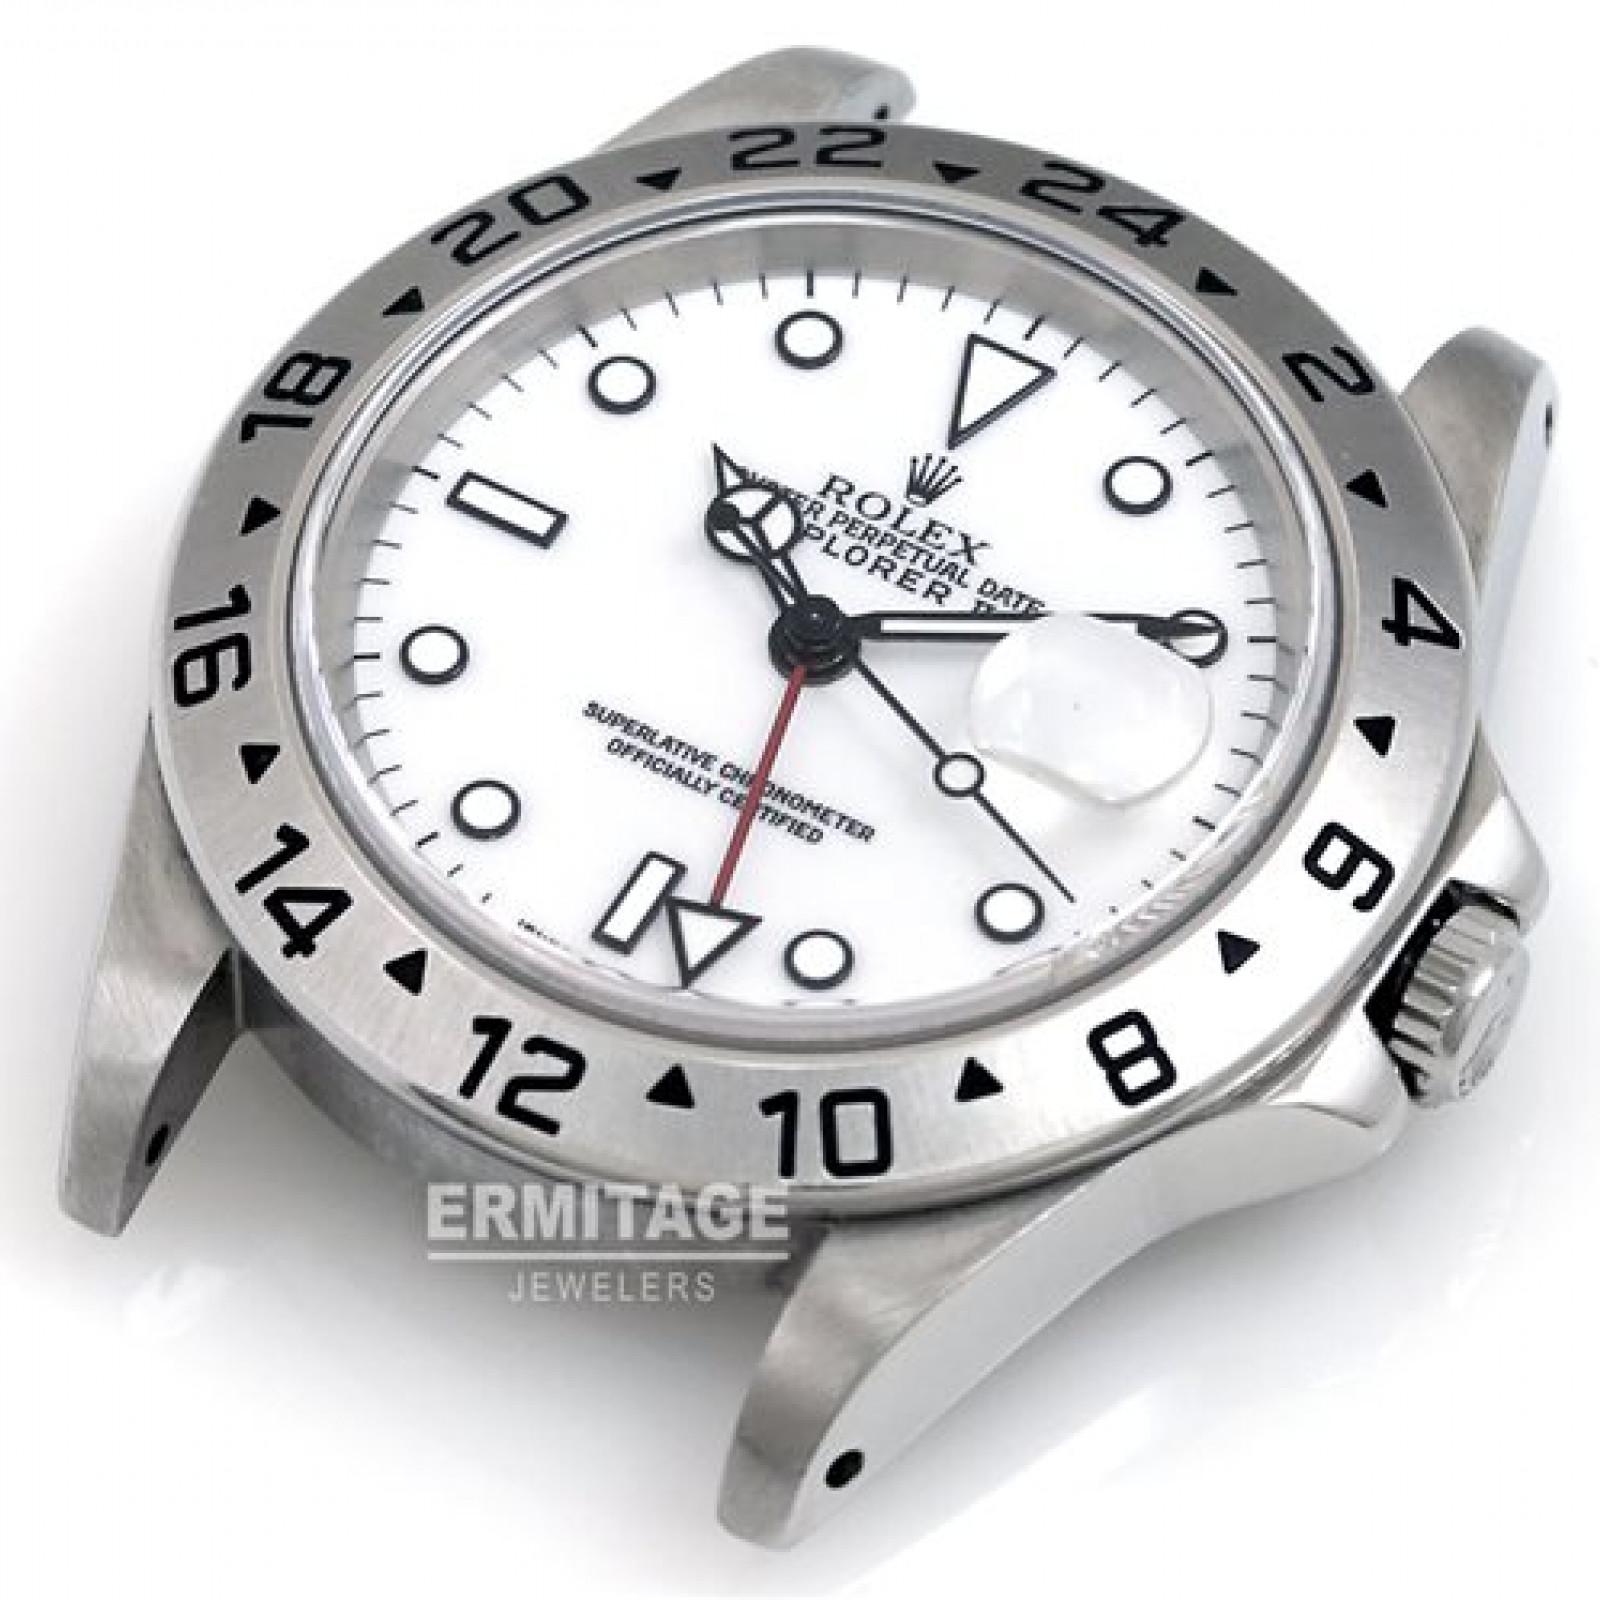 1995 Rolex Explorer II 16570 Polar